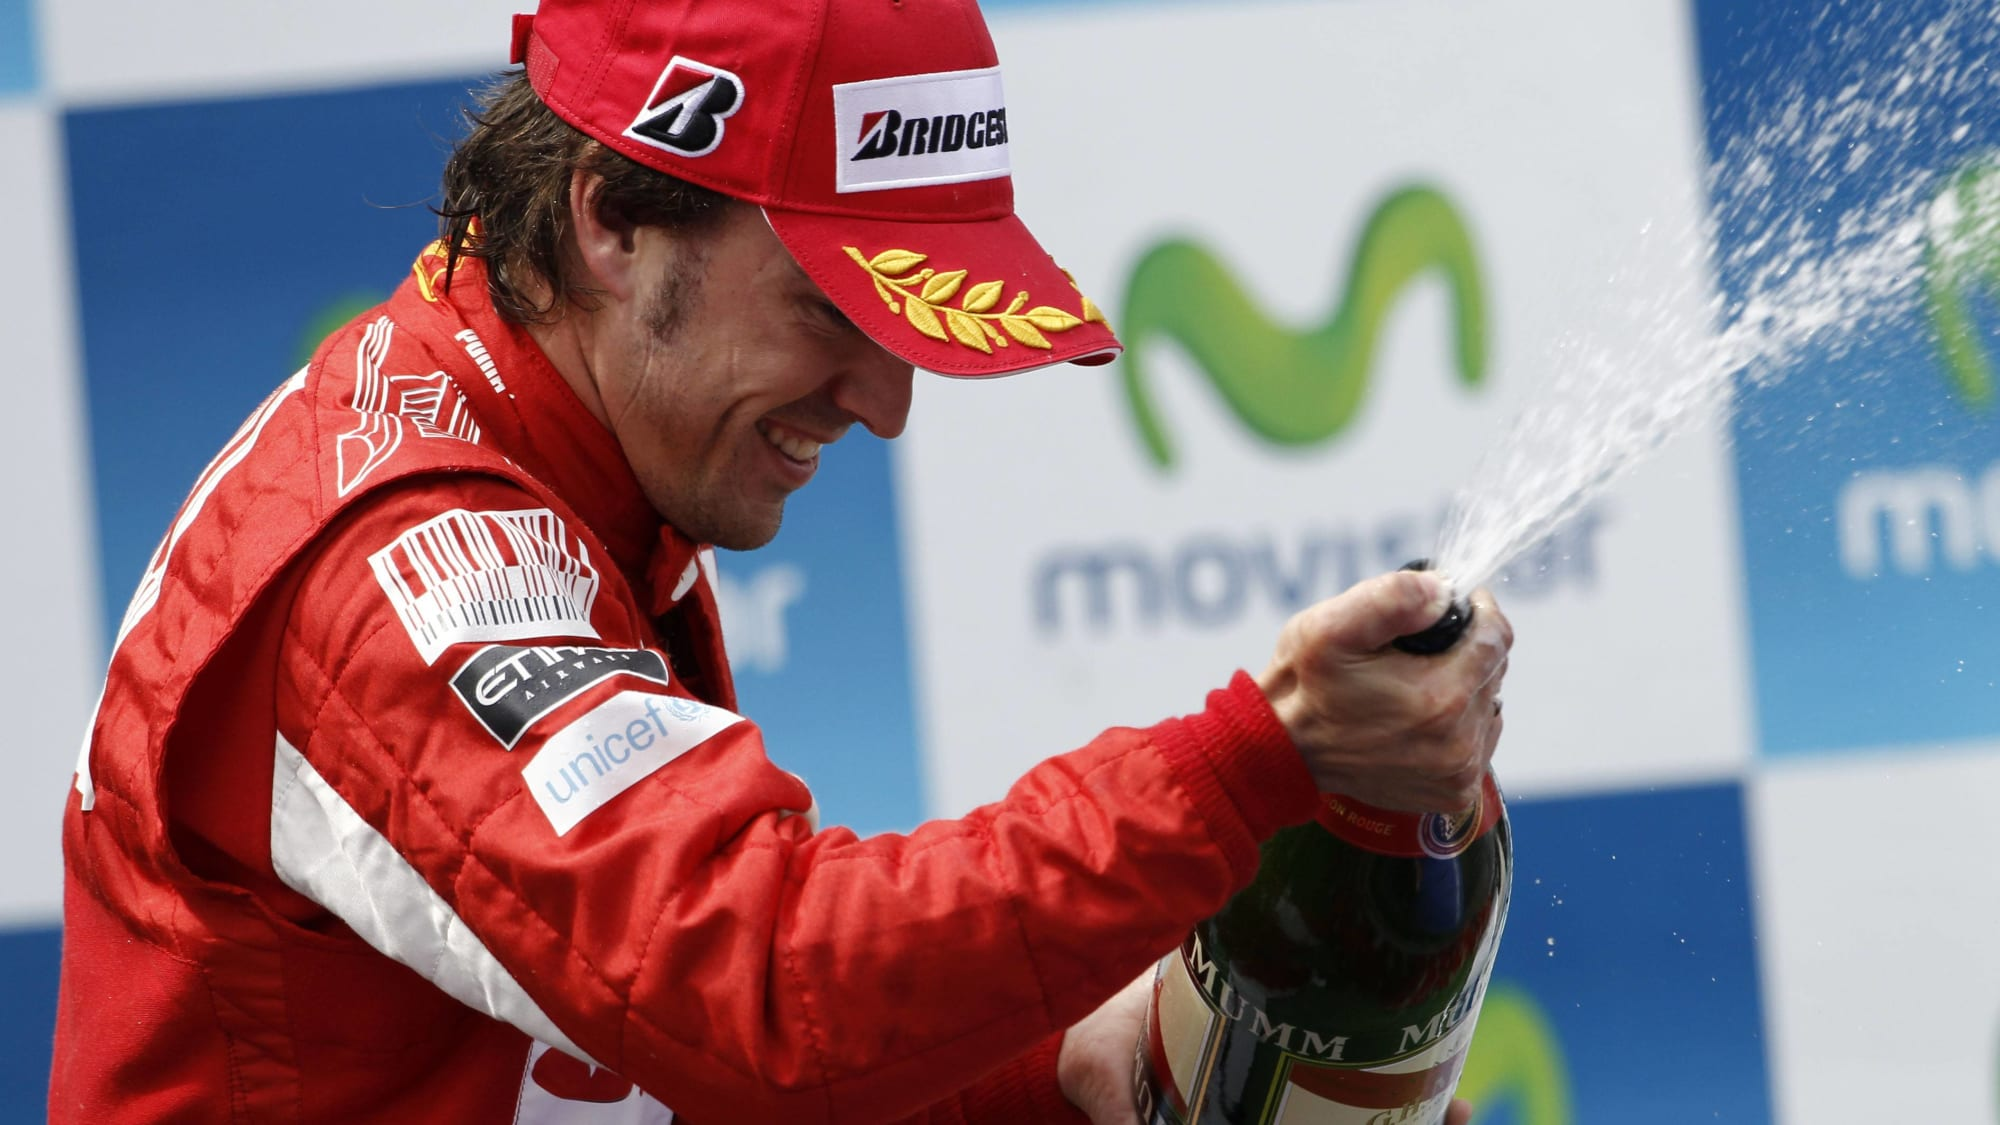 Meiste Formel 1 Siege